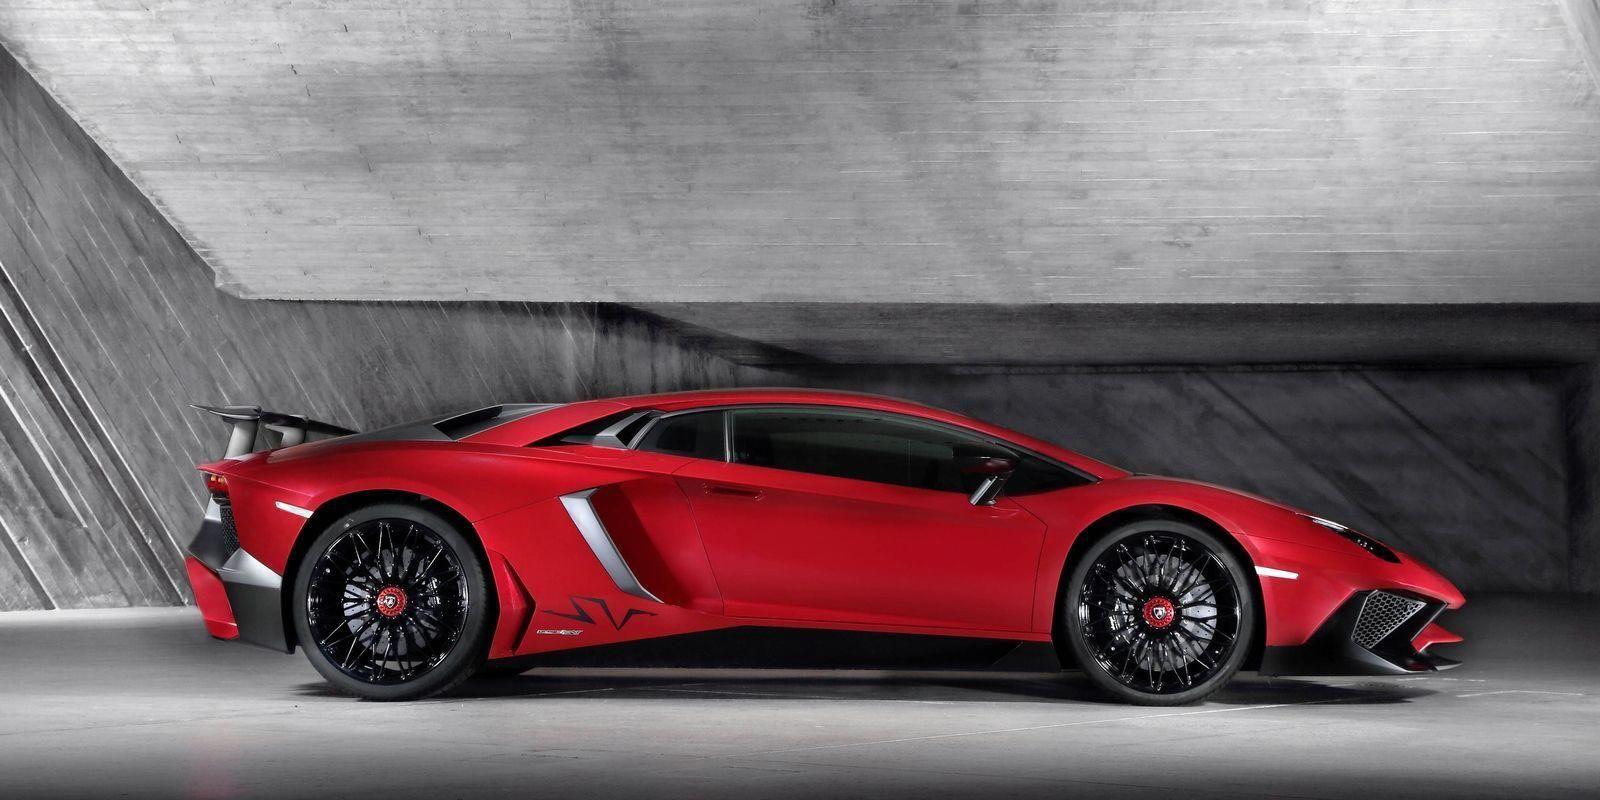 Lamborghini Aventador Lp 750 4 Sv Fastest Lambo Ever Luxurysportscars Lamborghini Aventador Lamborghini Cars Luxury Cars